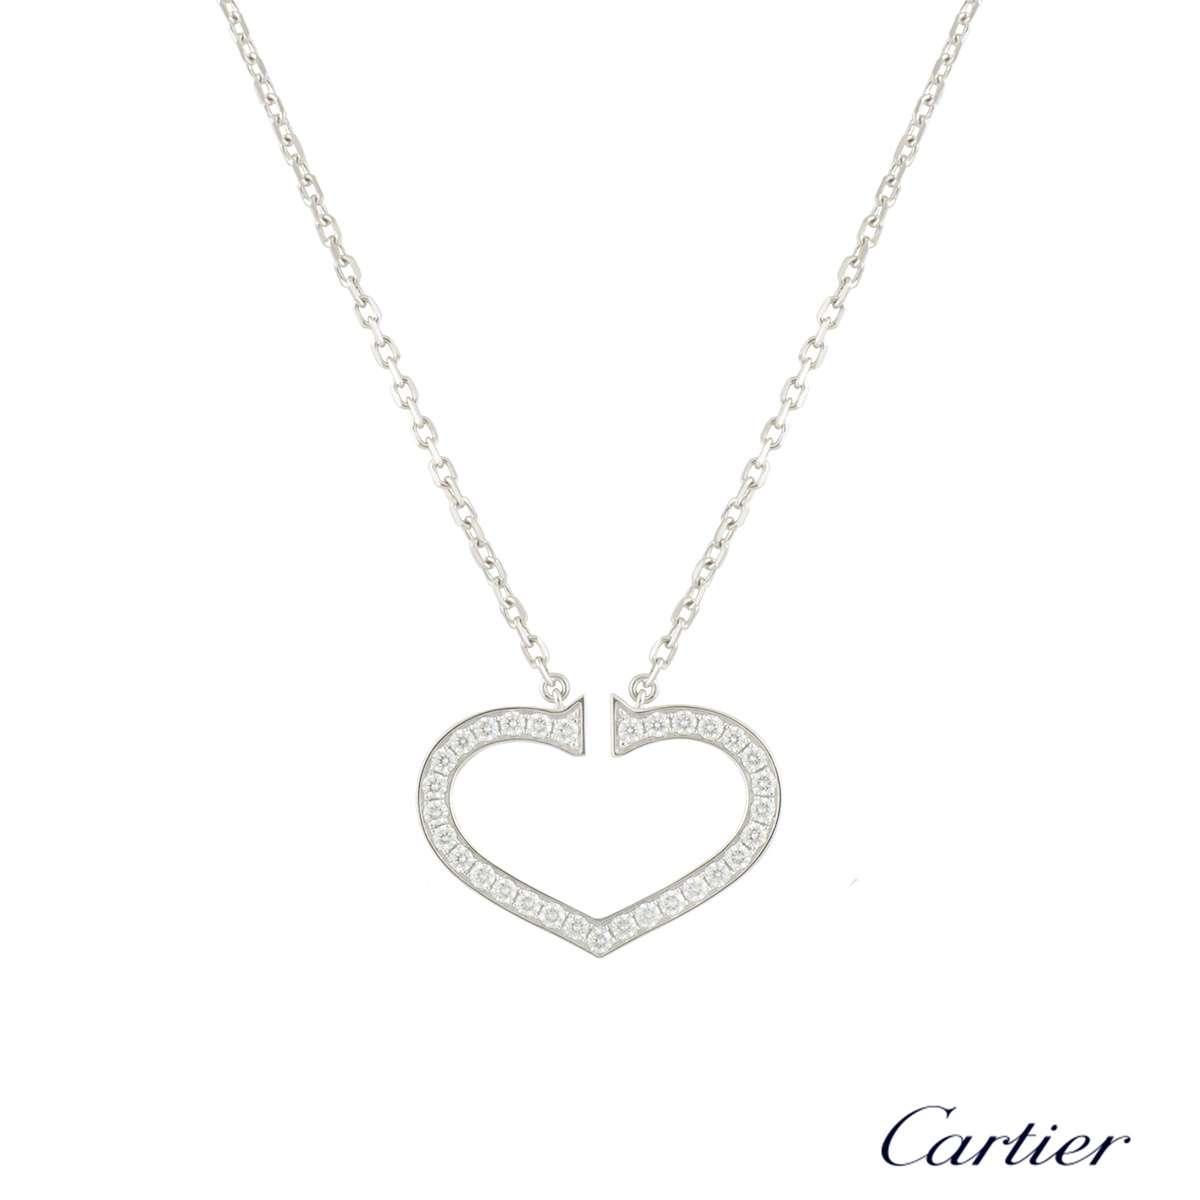 Cartier White Gold Diamond Hearts and Symbols Necklace 0.58ct G+/VS B3040600